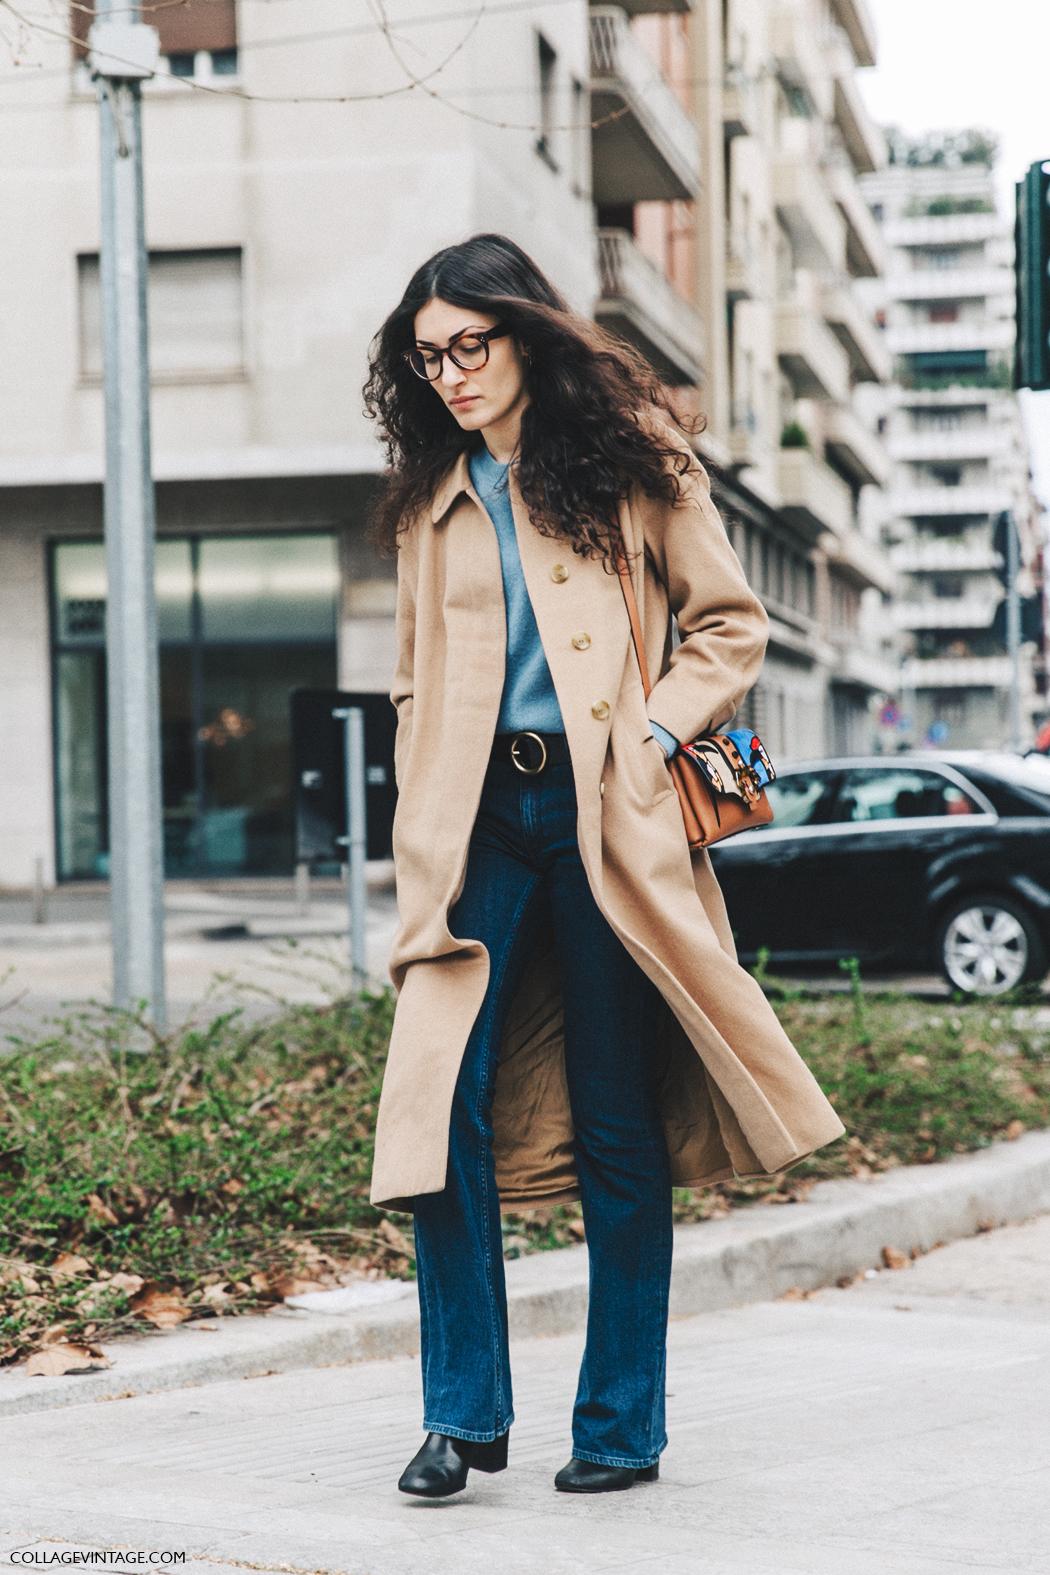 Milan_Fashion_Week_Fall_16-MFW-Street_Style-Collage_Vintage-Giulia_Tordini-Camel_Coat-Flared_Jeans-Paola_Cadematori_Bag-2